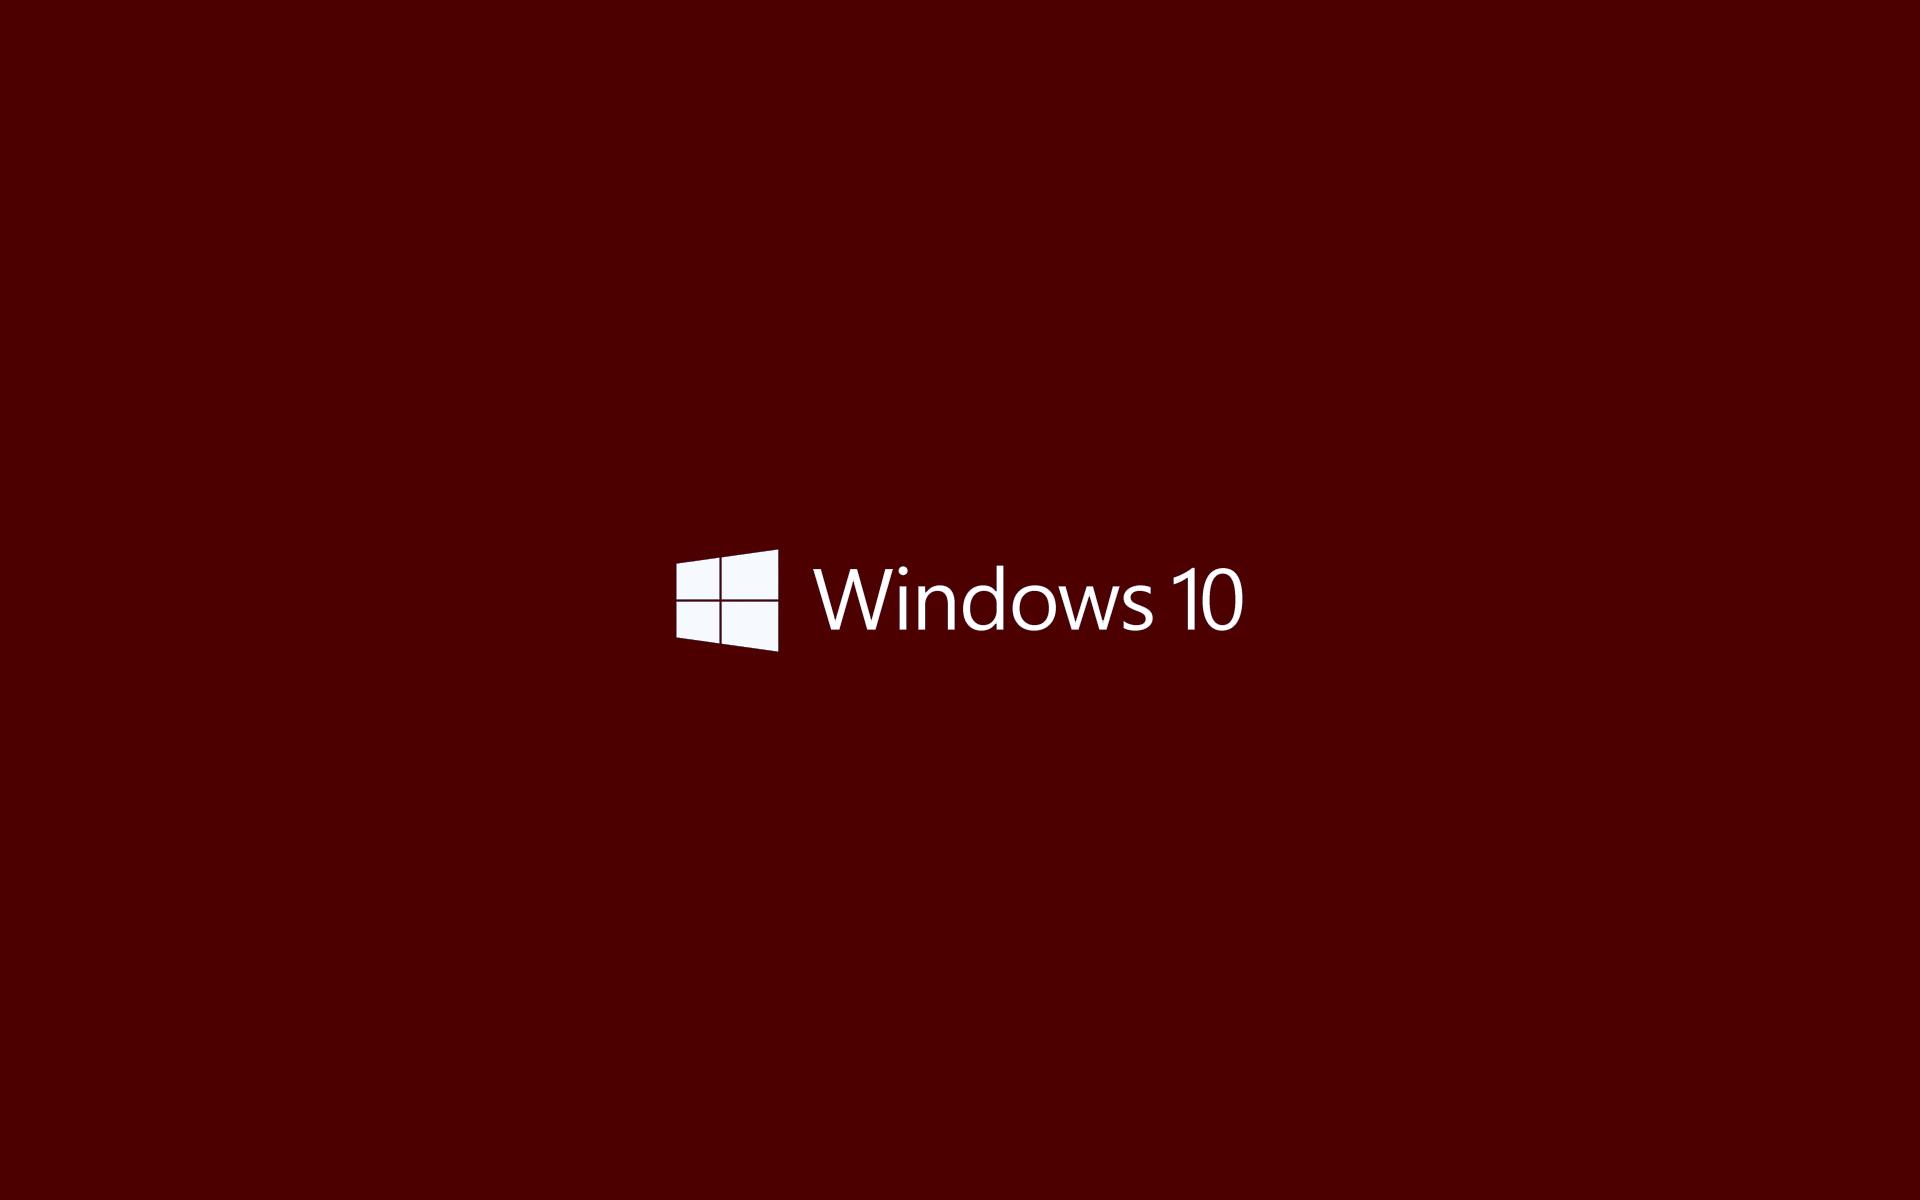 Windows-10-HD-Wallpaper-Plain-2